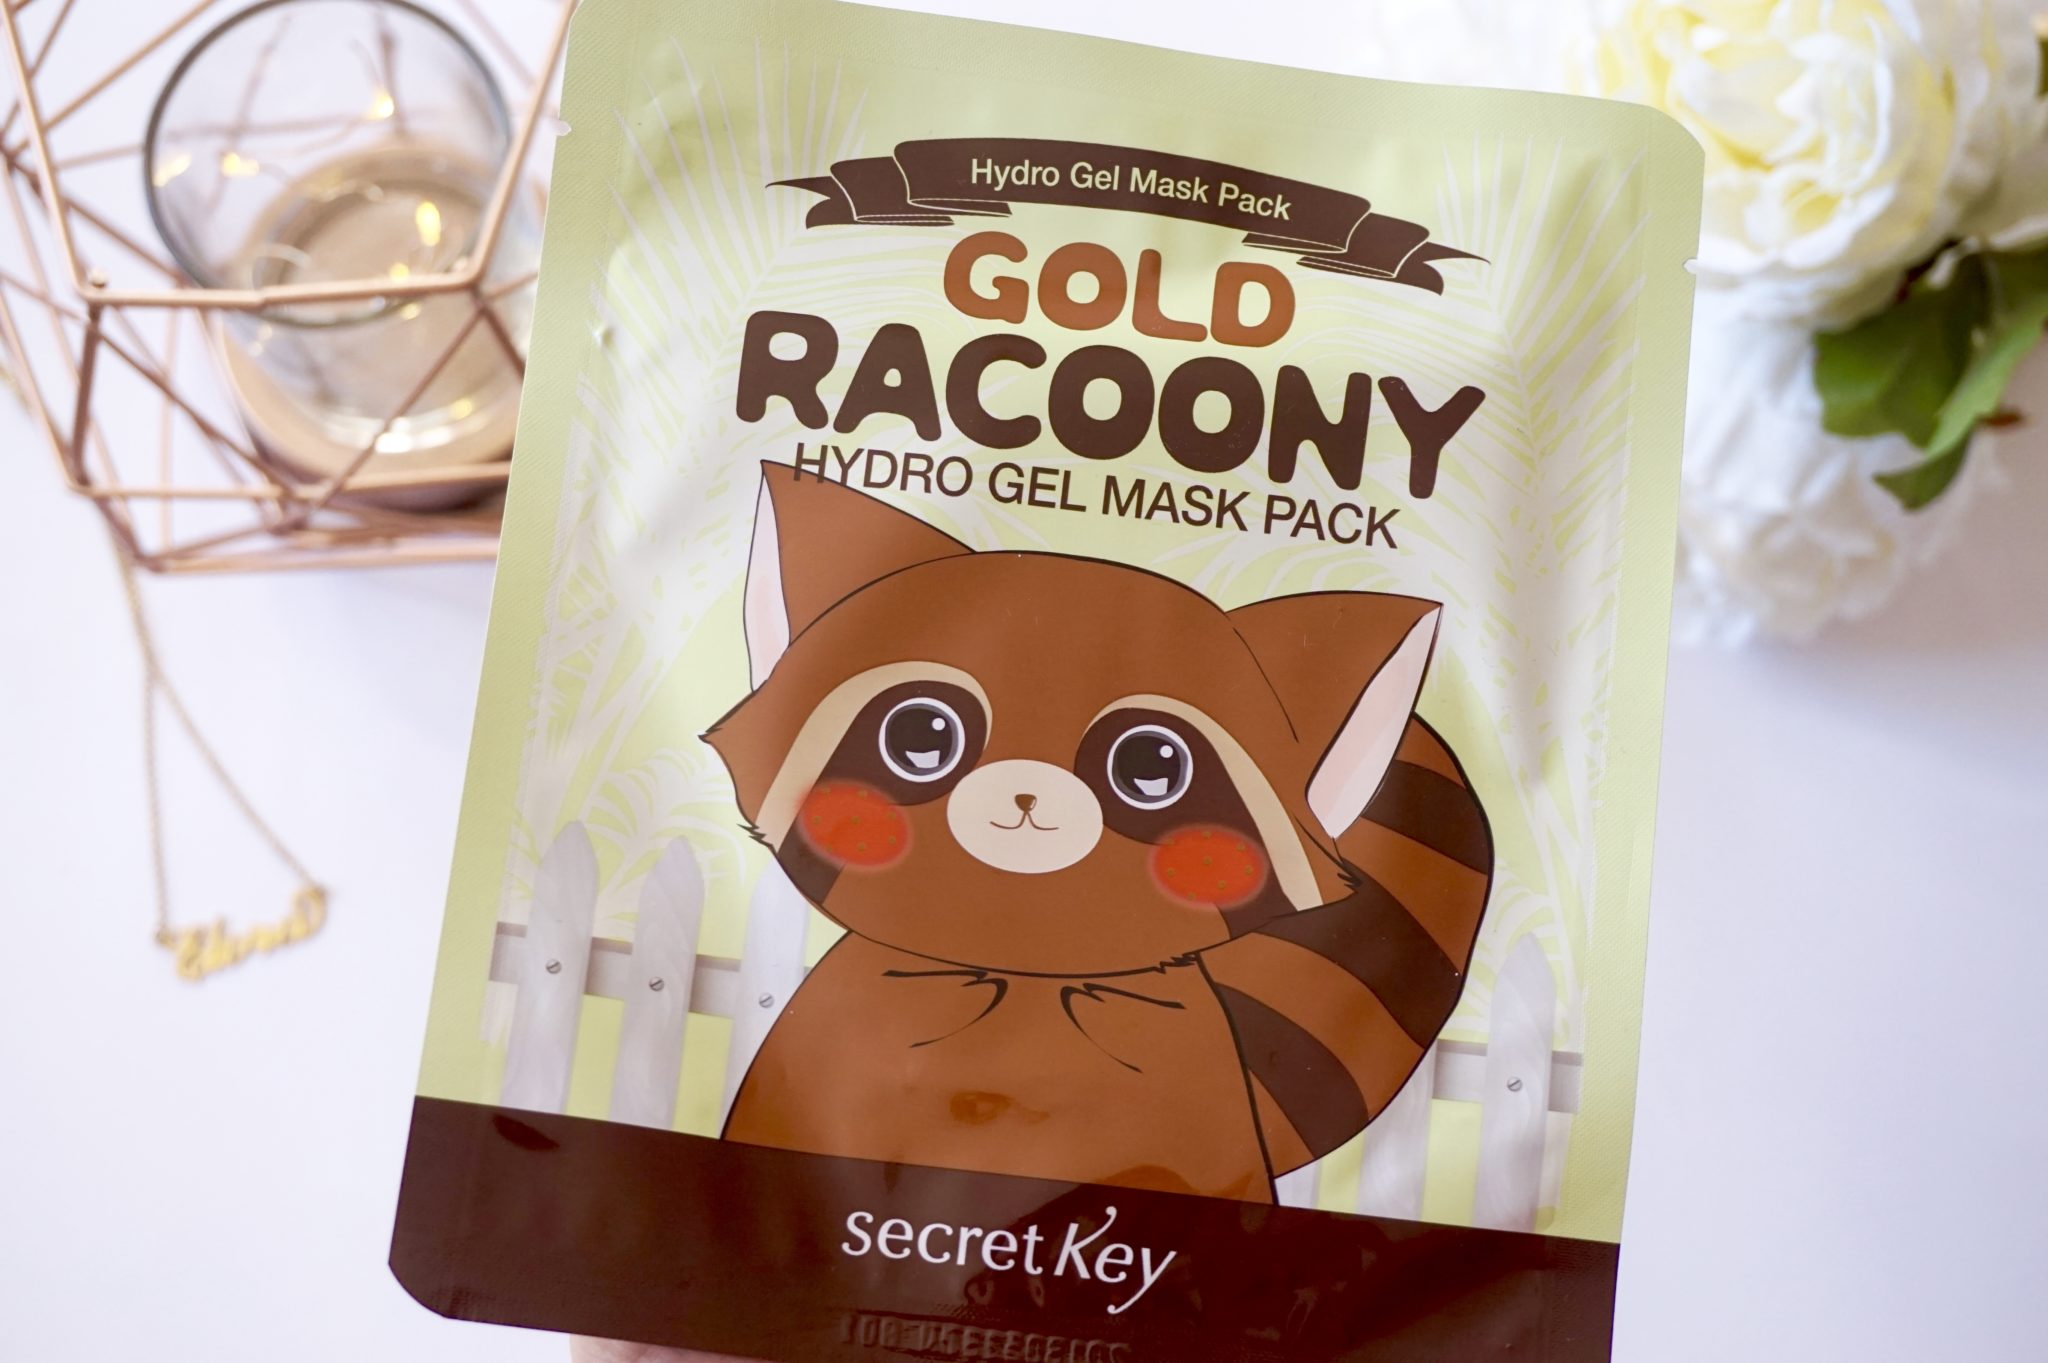 Masque coréen hydratant Gold Racoony par Secret Key